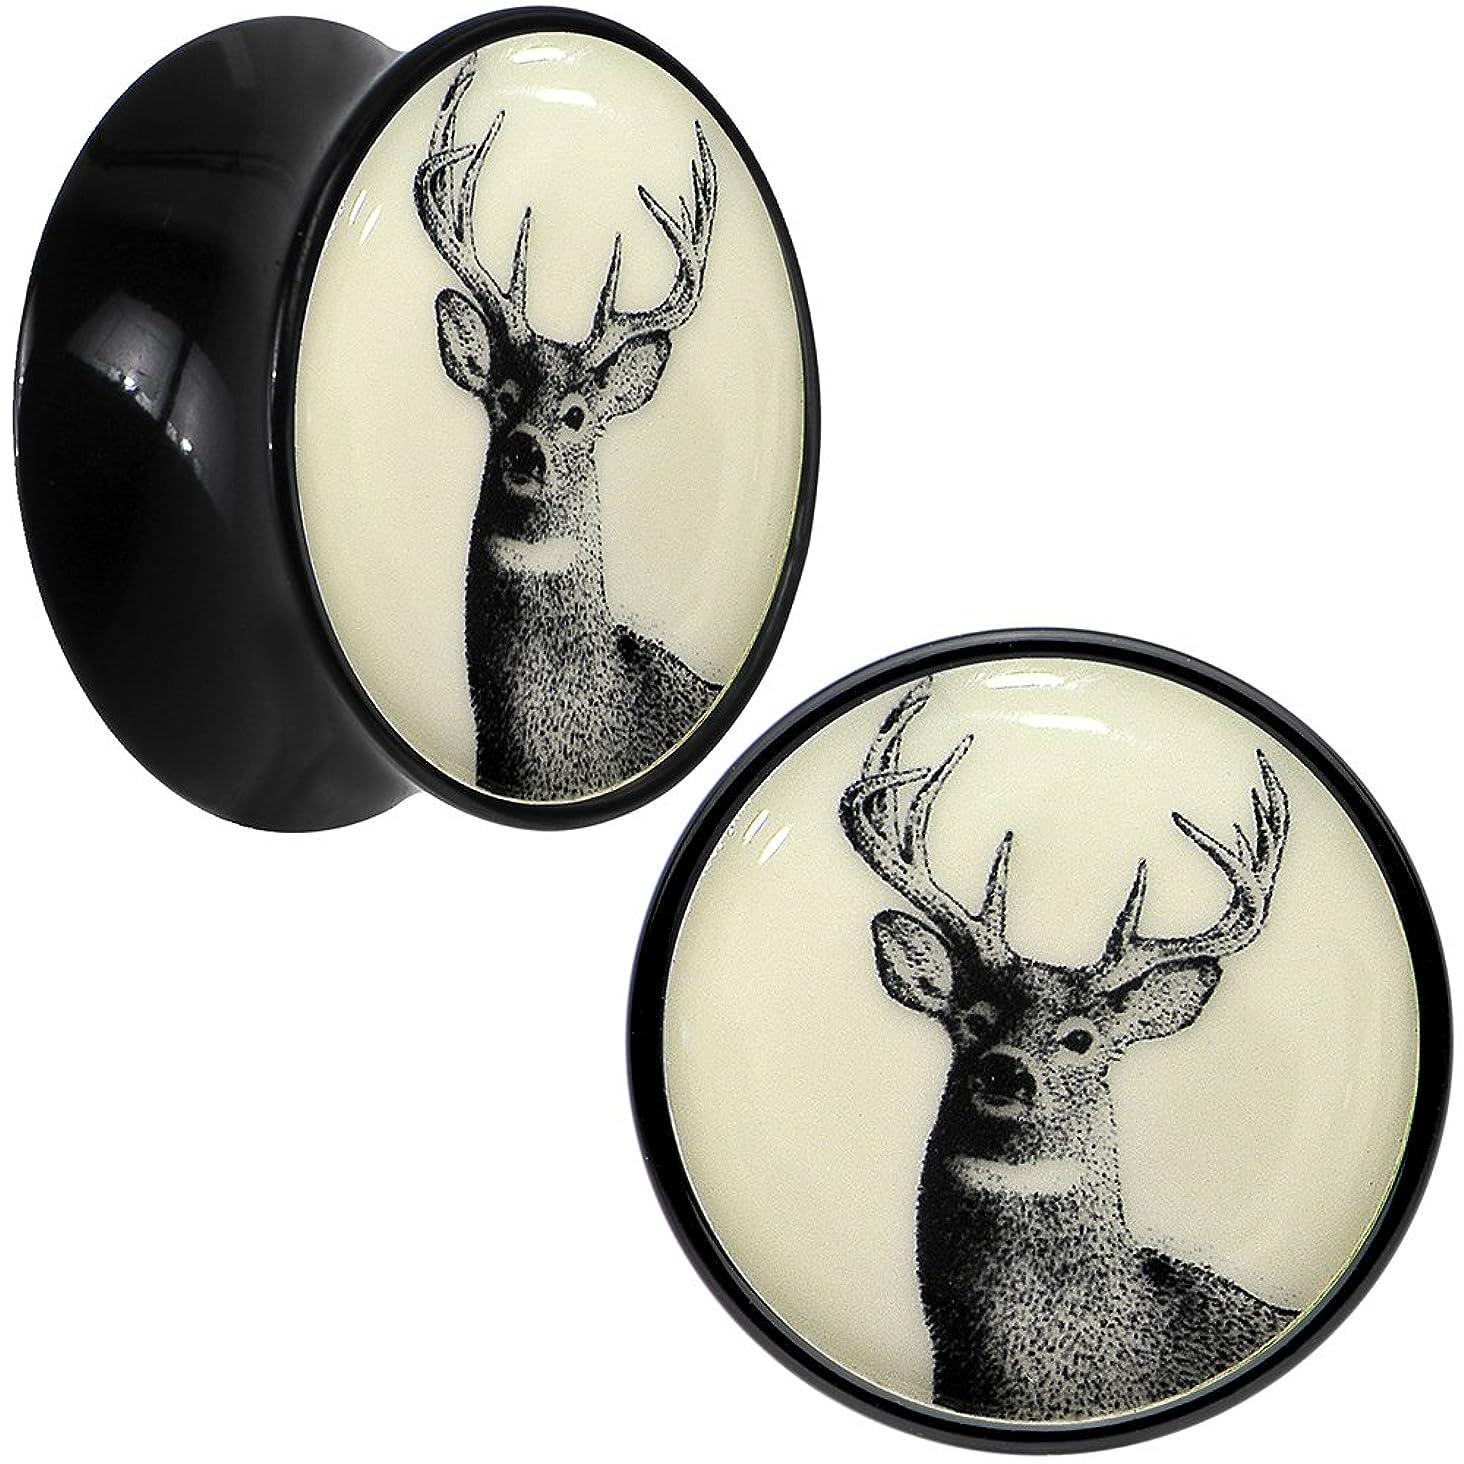 Body Candy Black Acrylic Buck Deer Glow in The Dark Saddle Ear Gauge Plug Pair 5/8